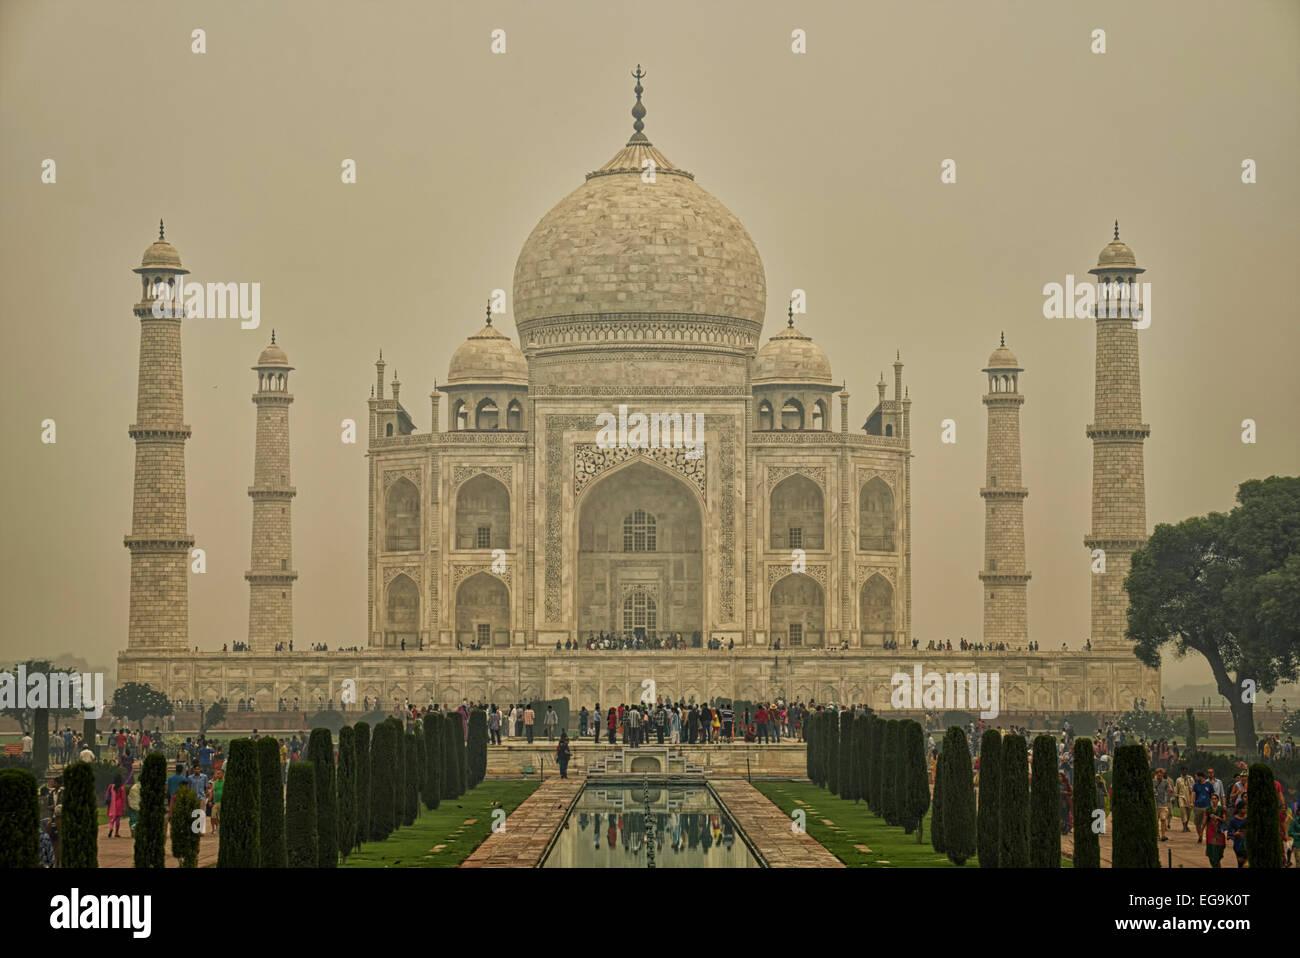 Busy Taj Mahal - Stock Image